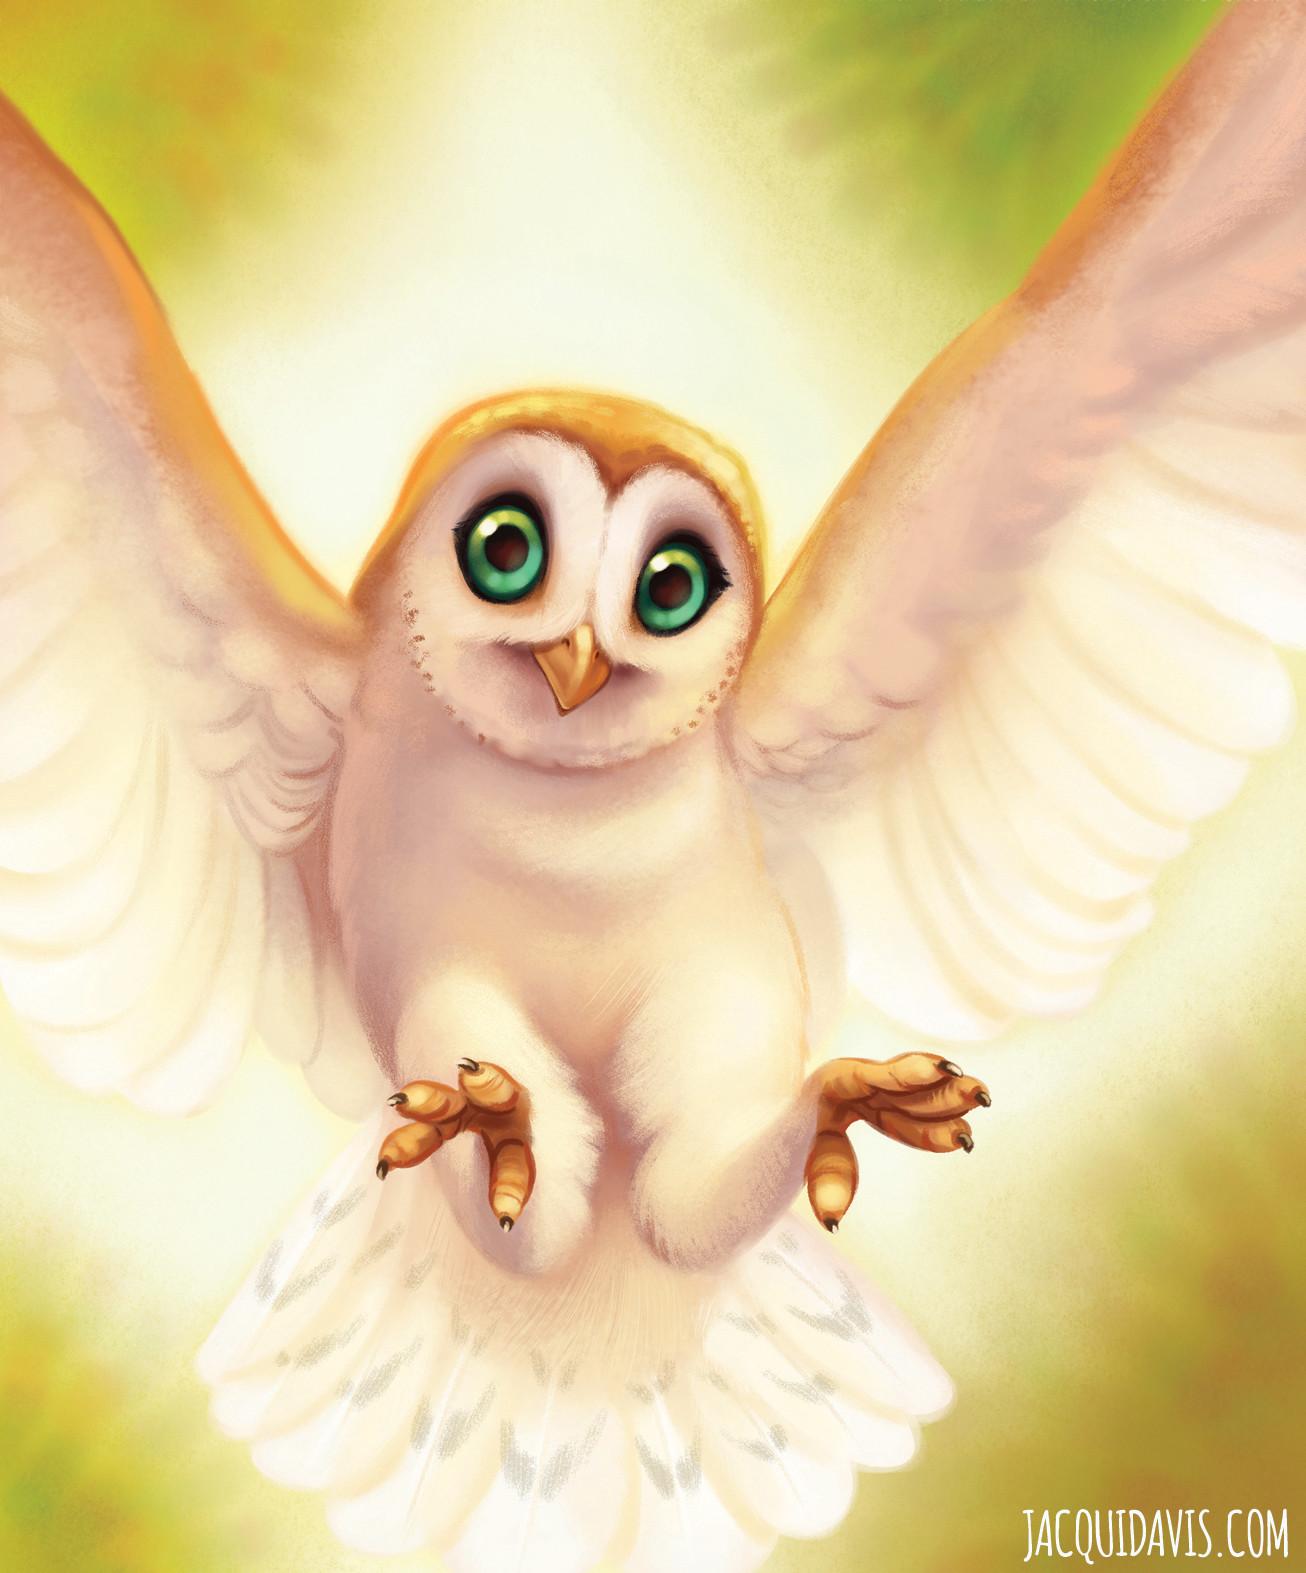 Jacqui davis jacquidavis owl copy